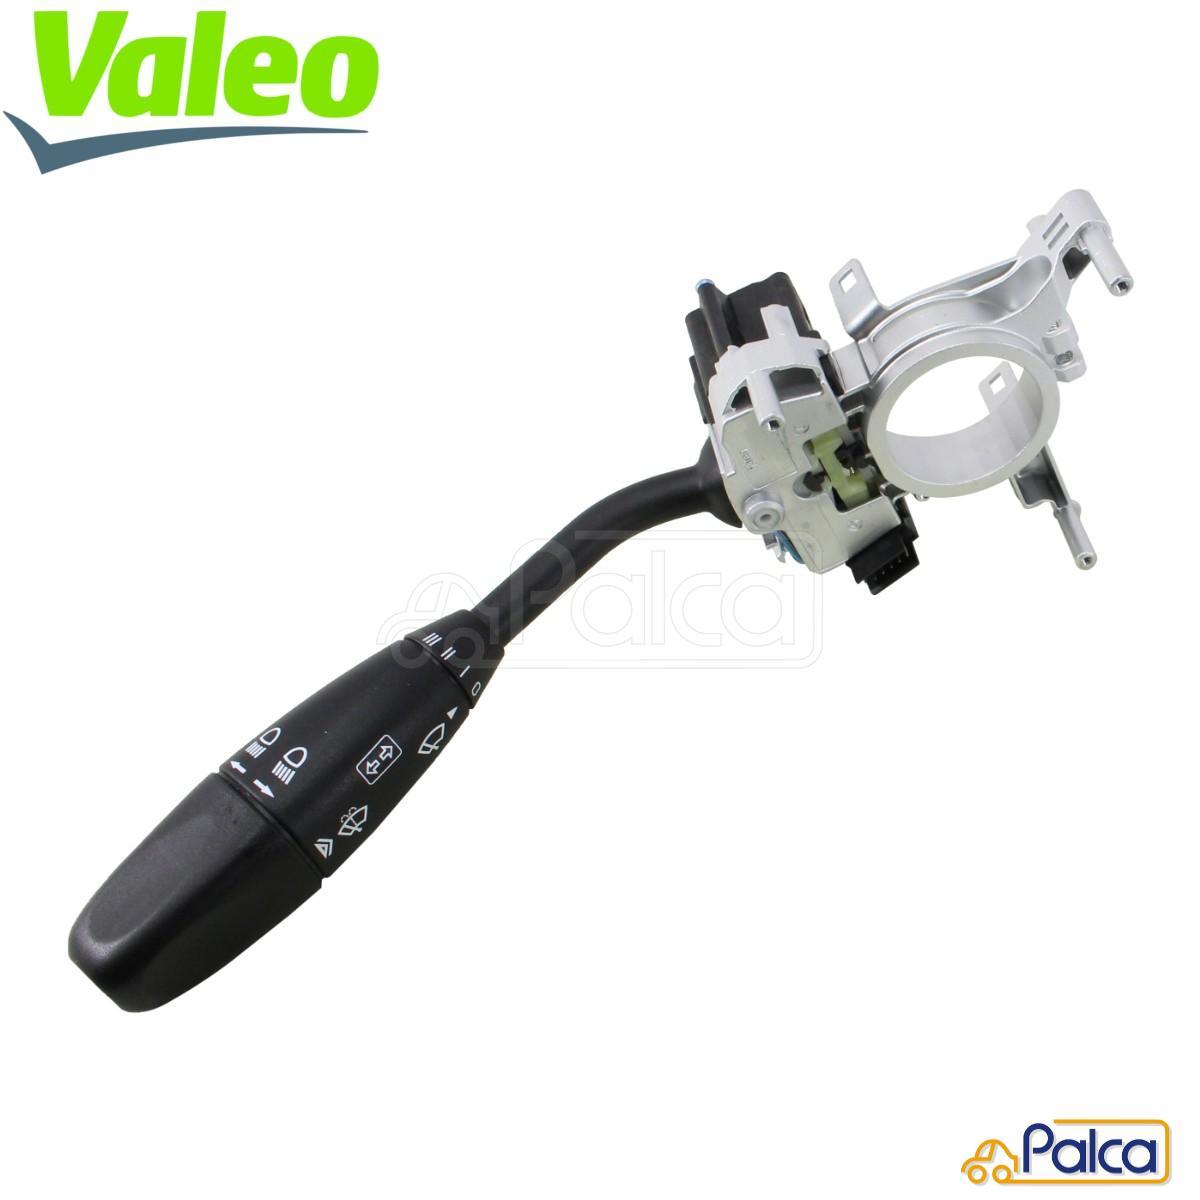 VALEO製 新品 あす楽 ベンツ ウインカーレバー ワイパーレバー ターンシグナルスイッチ W203 S203 CL203 C200 C280 C55AMG 登場大人気アイテム C240 2035450310 C32AMG C230 C180 C320 爆買い送料無料